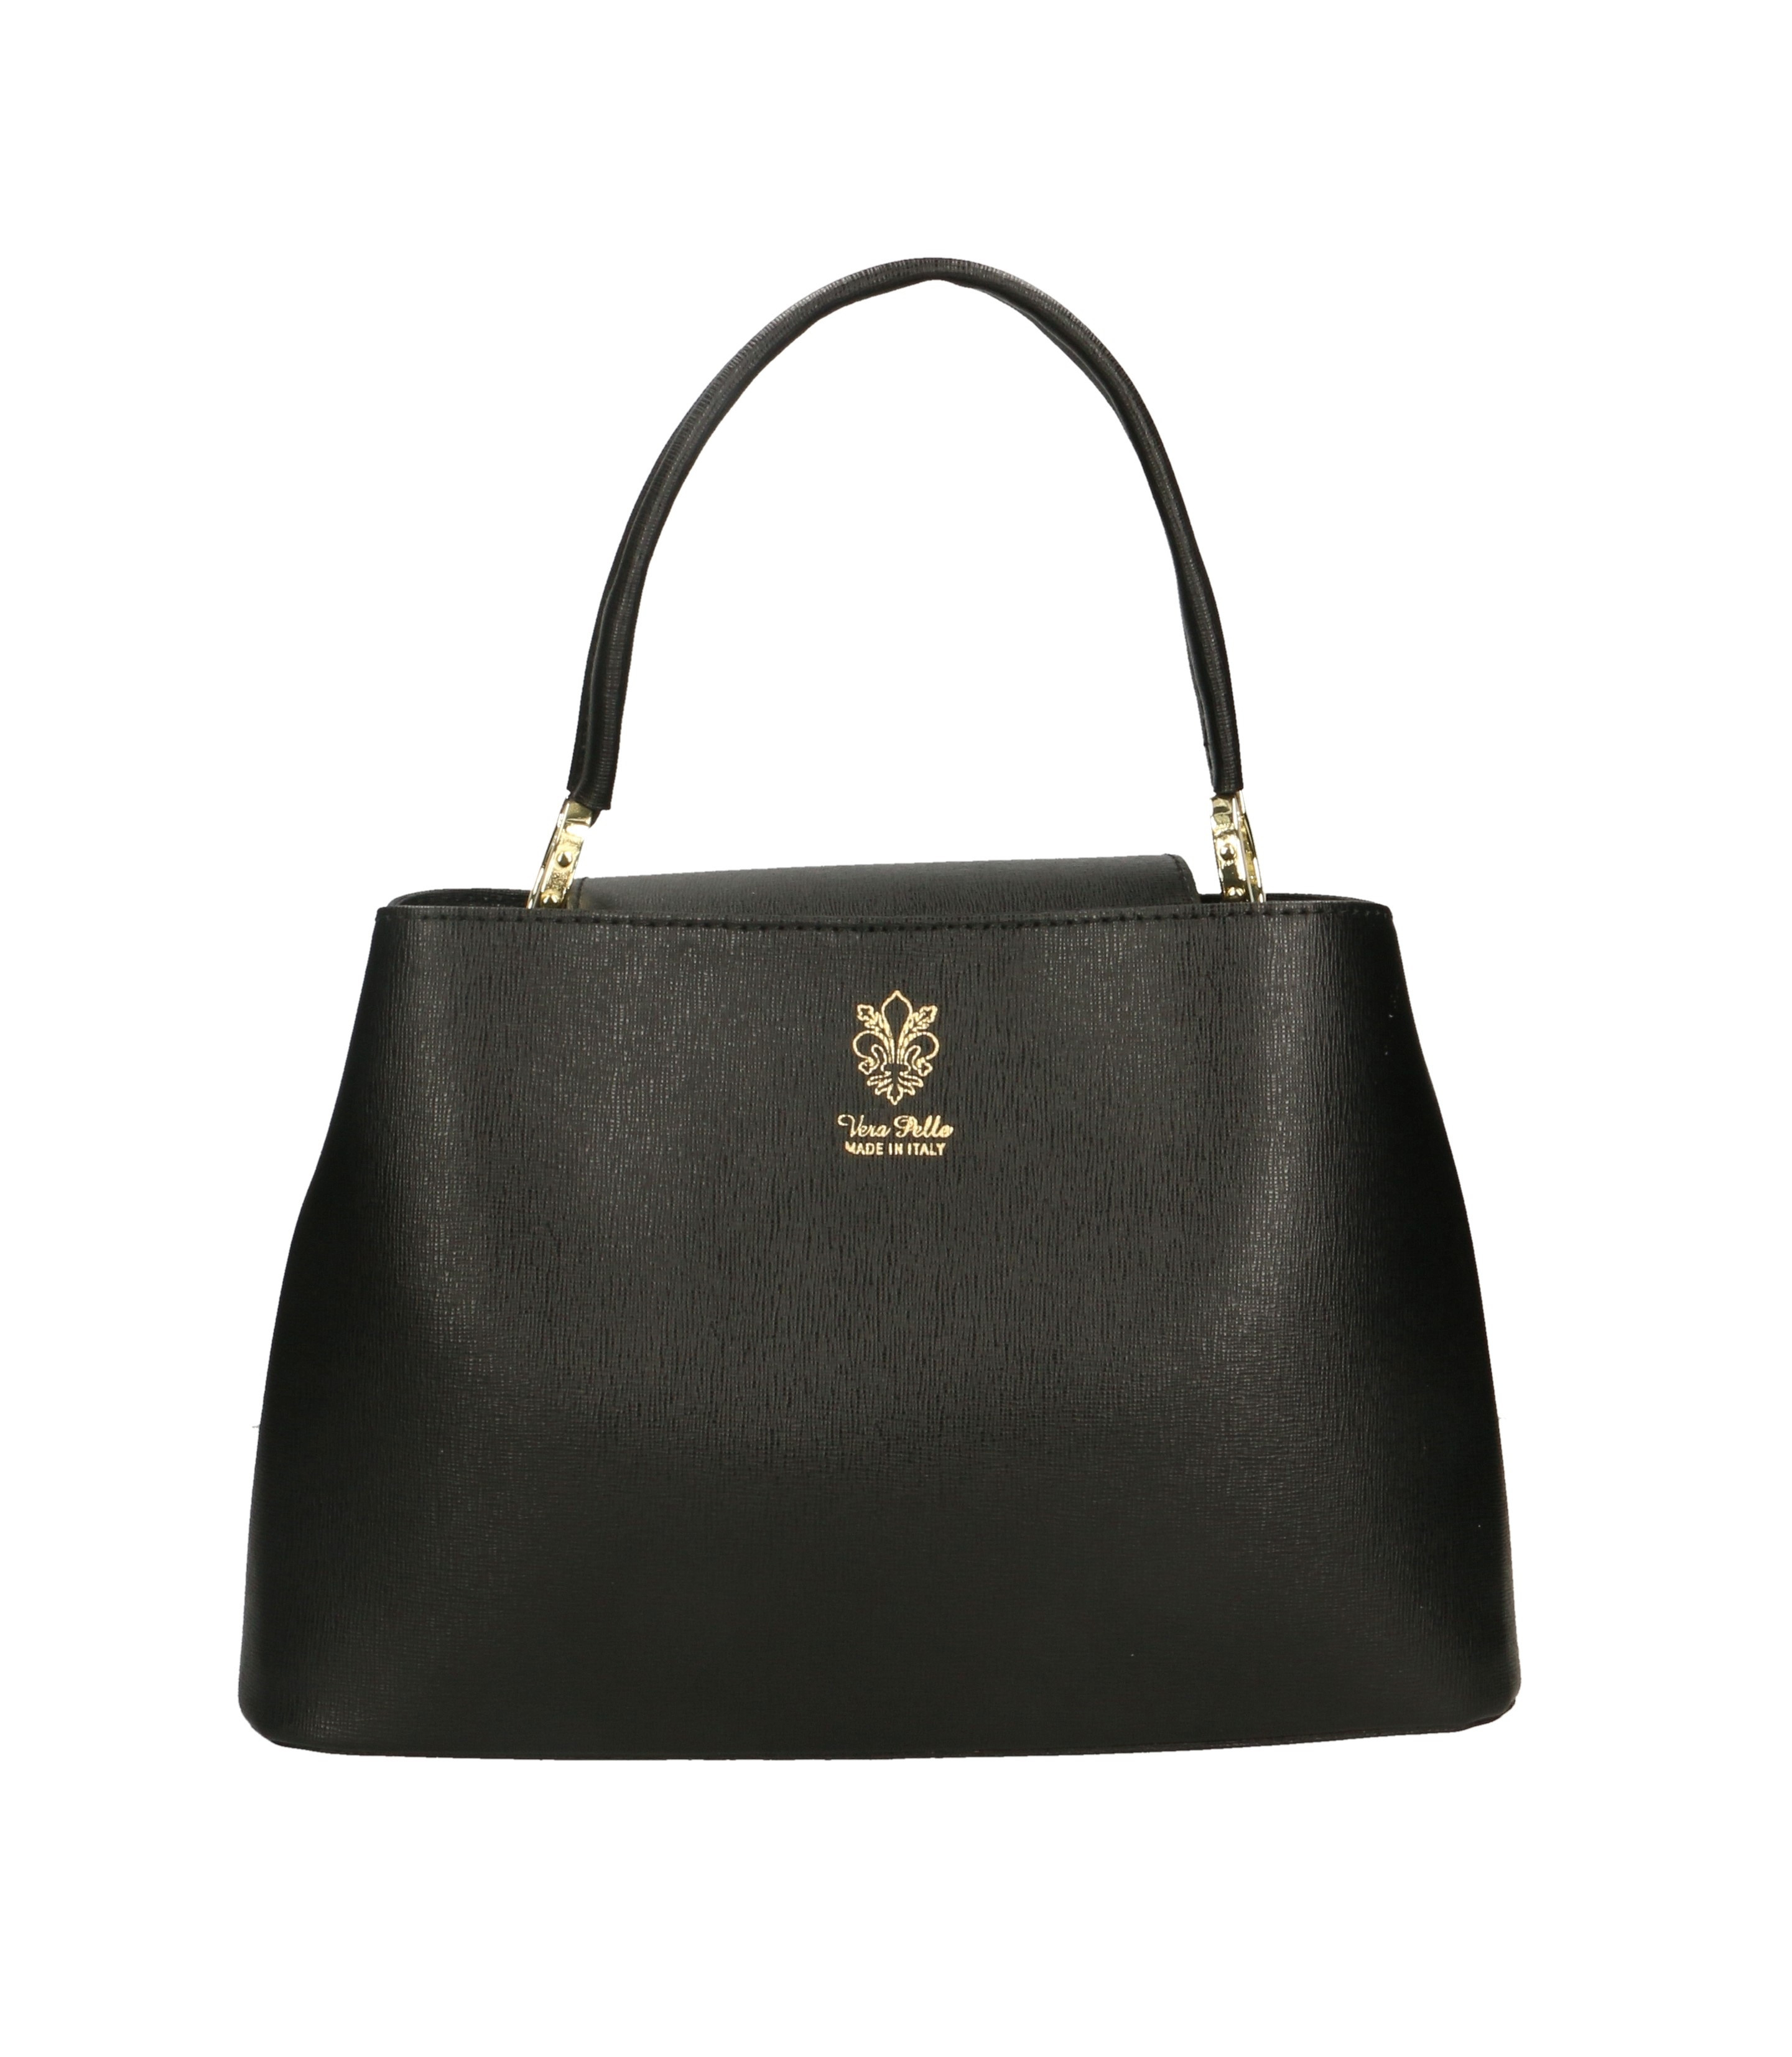 Kožená malá černá kabelka do ruky samantha